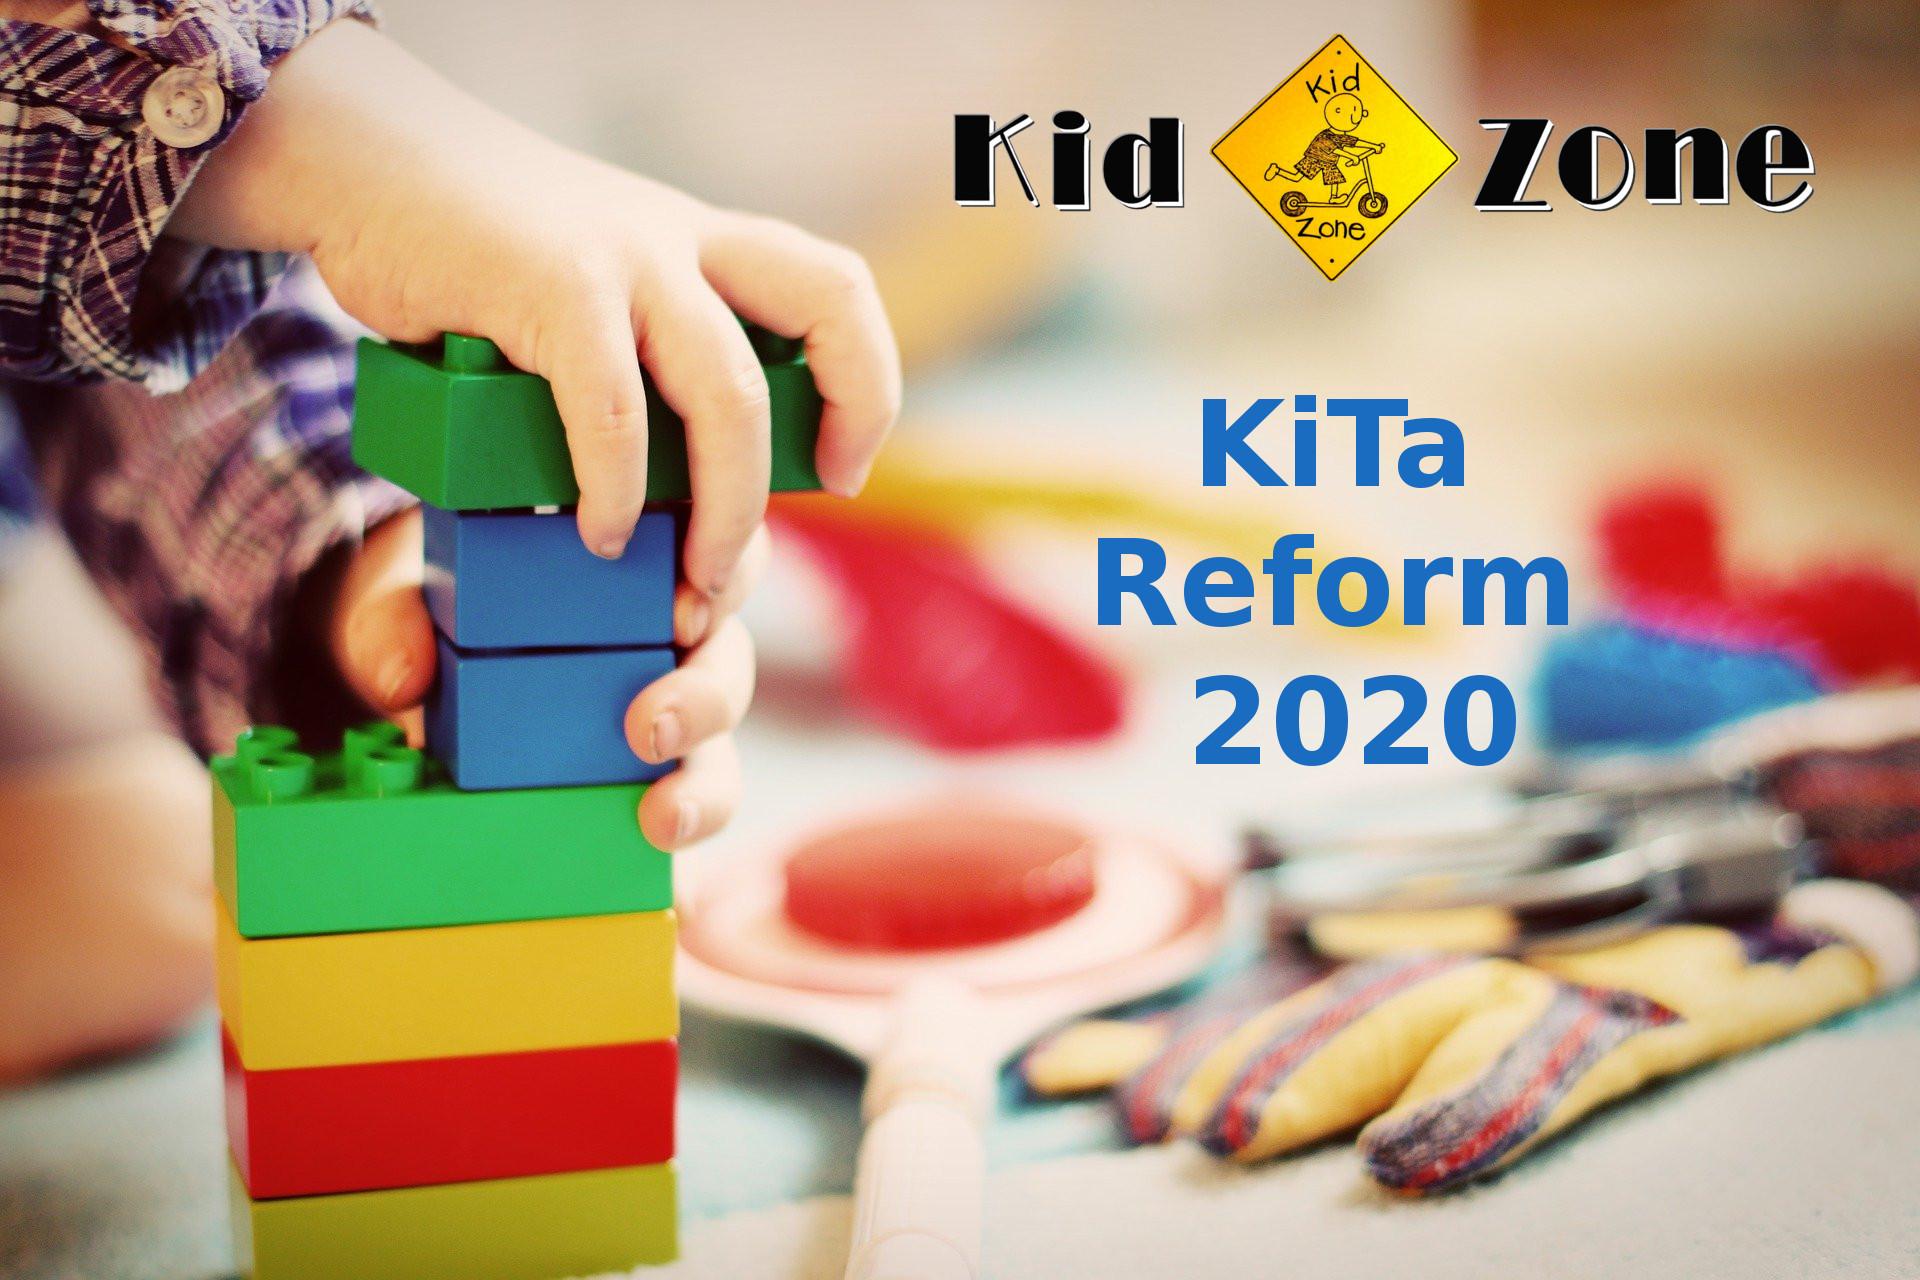 Kita-Reform-2020-Kitaplatz-288-Euro-pro-Monat-40-stunden